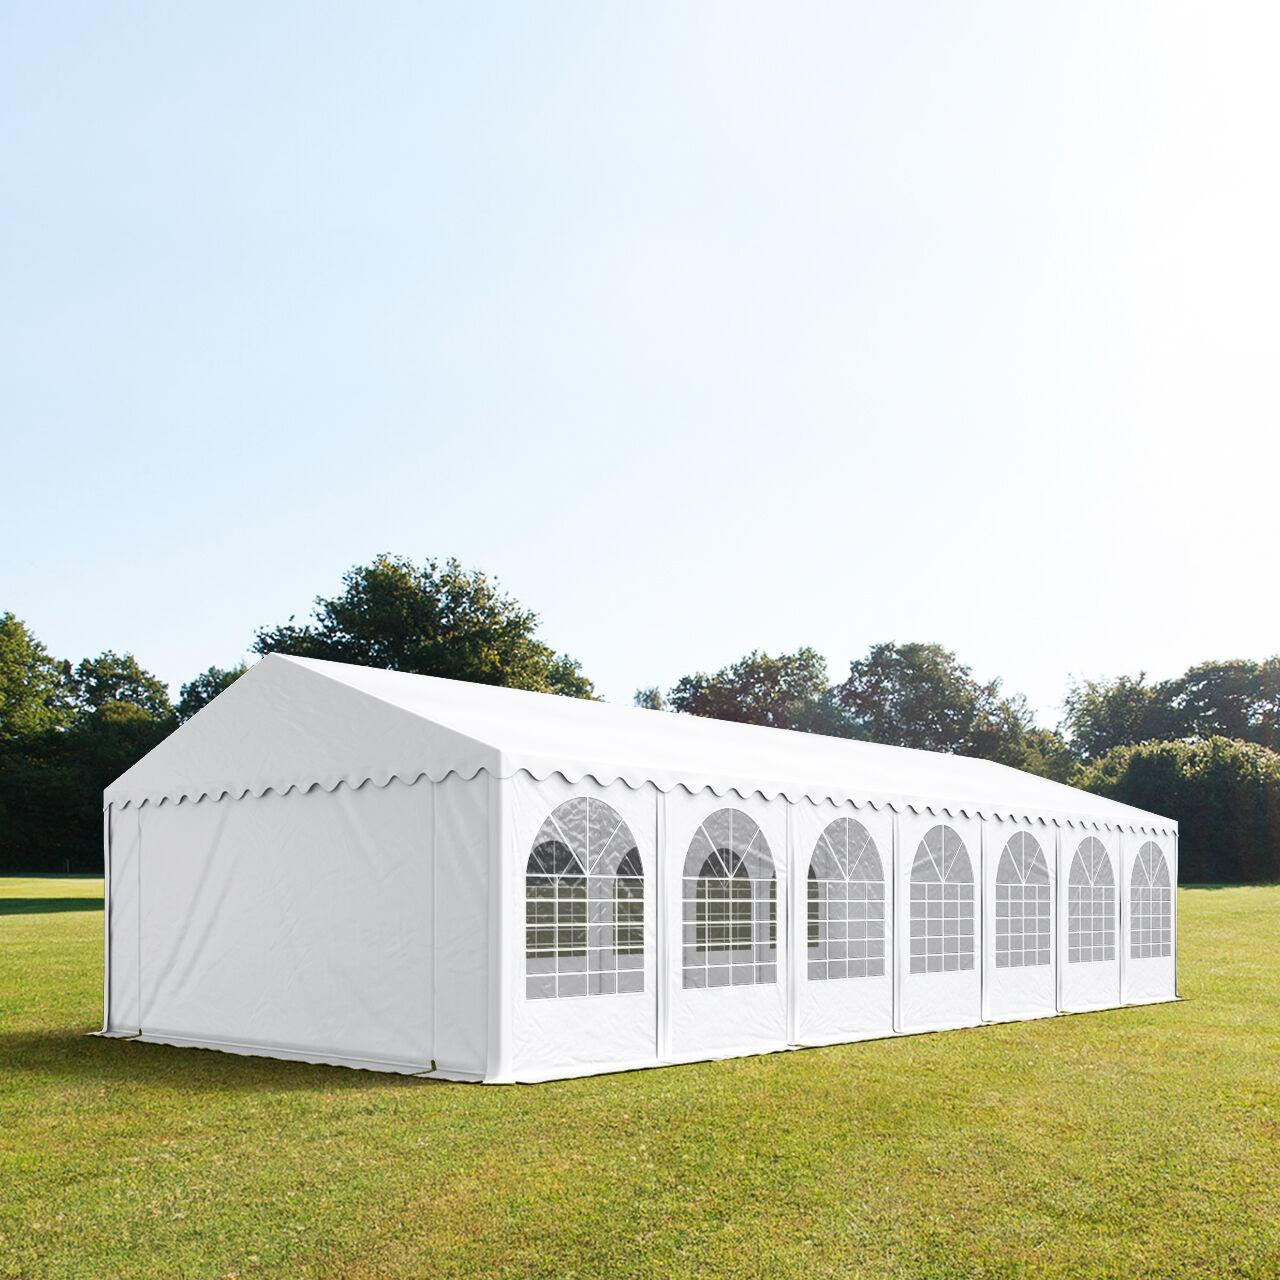 Toolport Tendone per Feste 6x14m PVC 550 g/m² bianco impermeabile